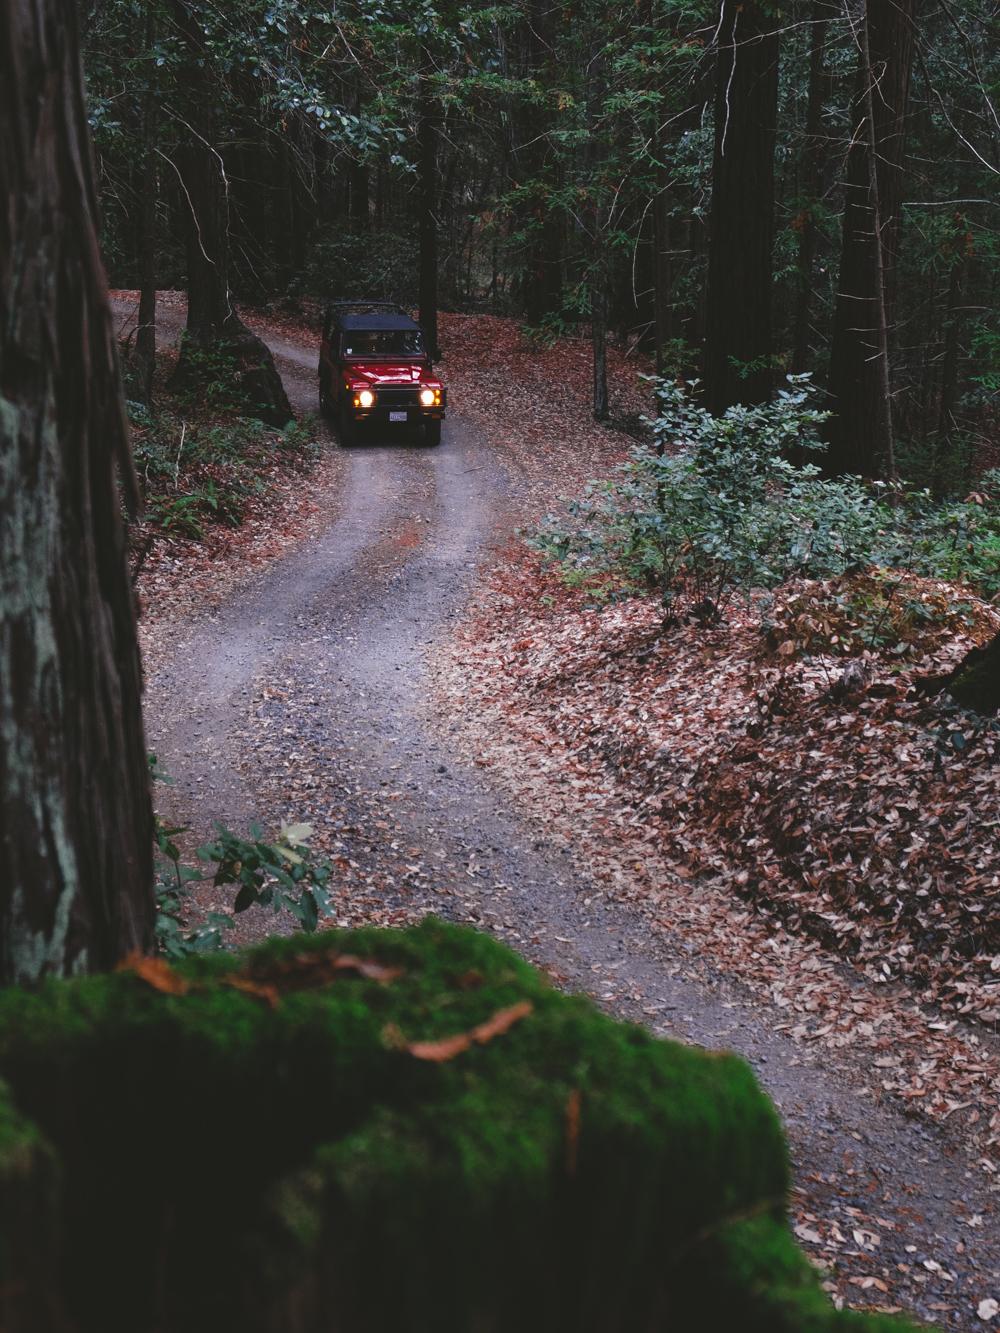 Land_Rover-Defender-Cookwilltravel-Huckberry.jpg